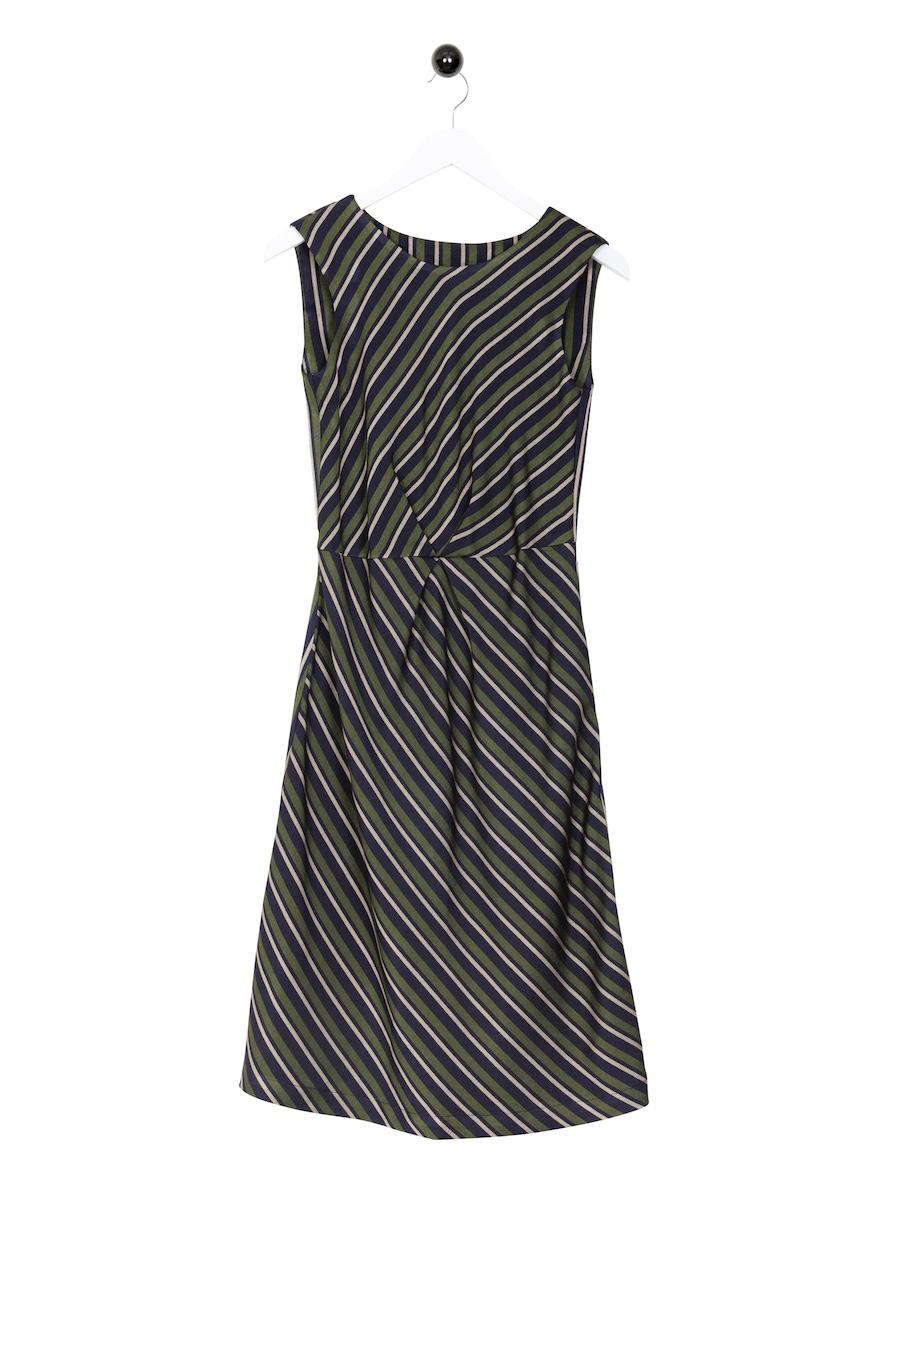 Ellister Dress